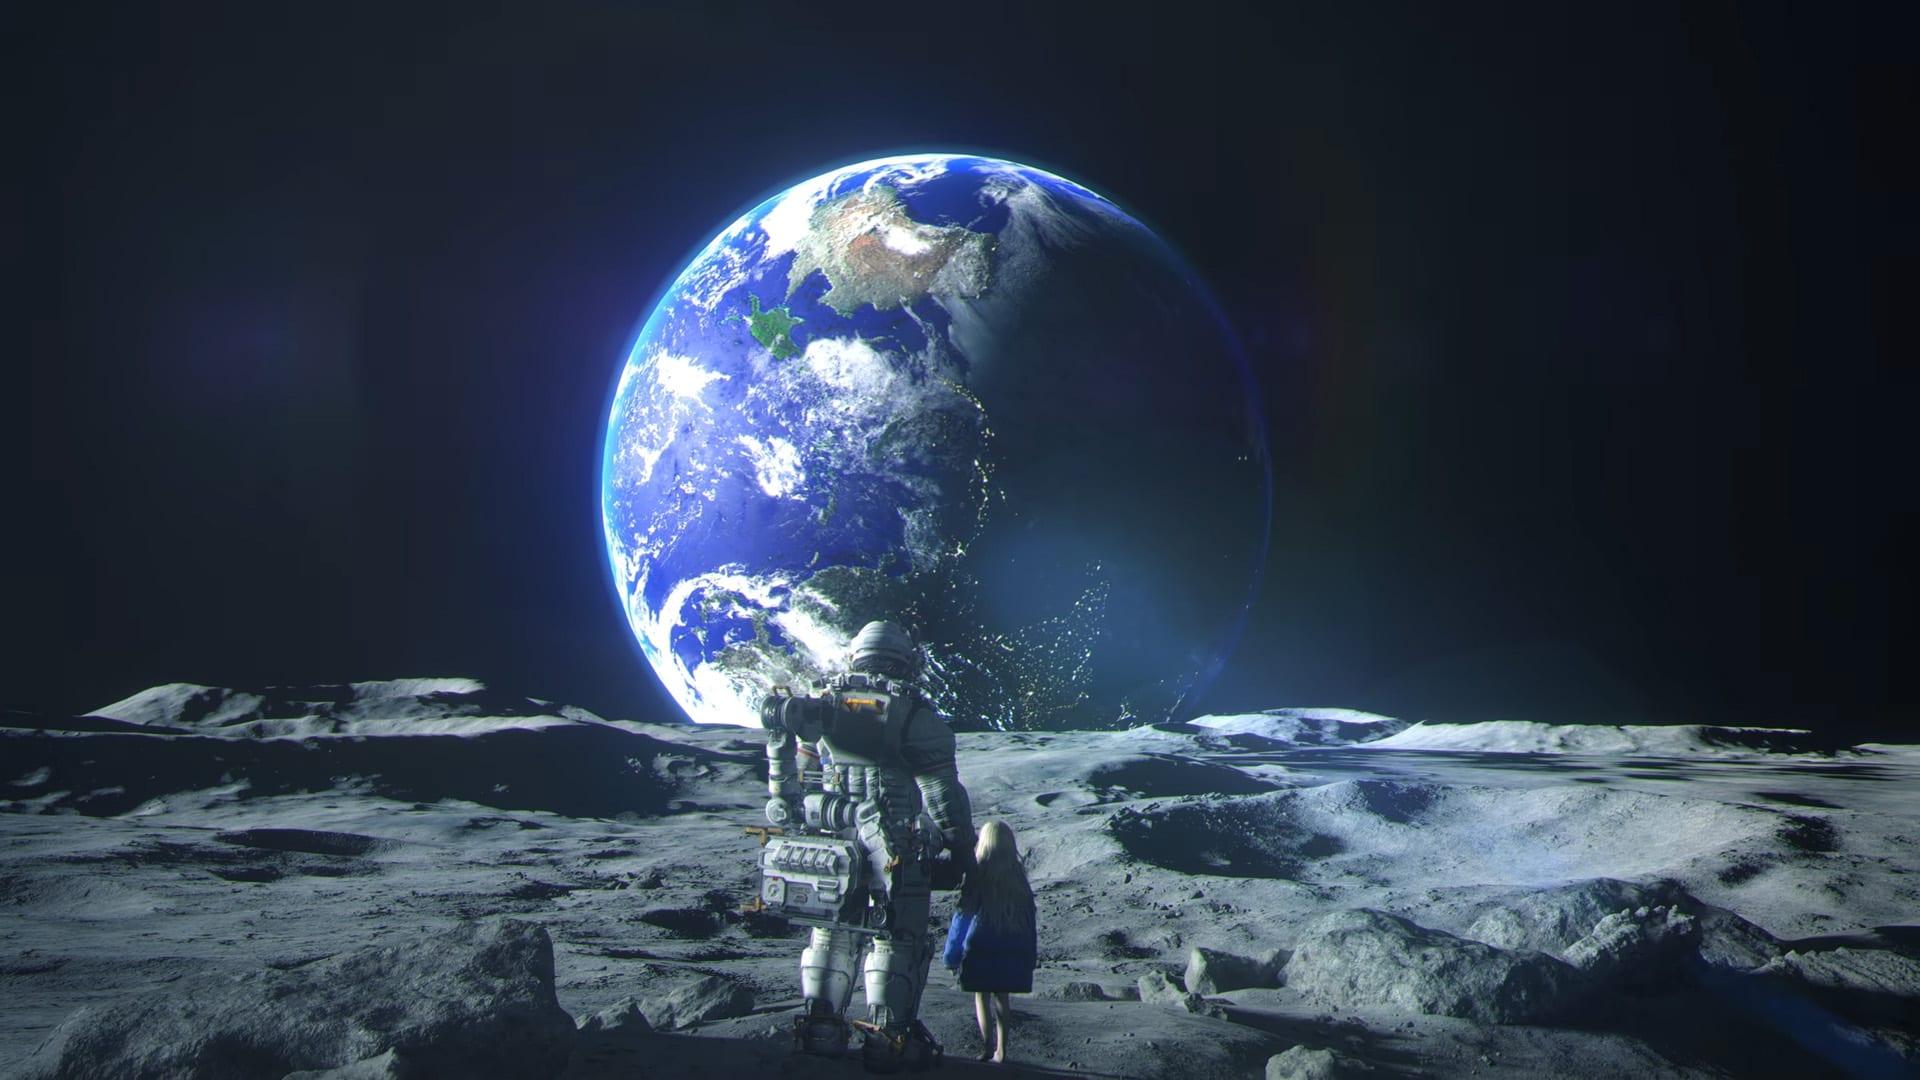 Pragmata Mond